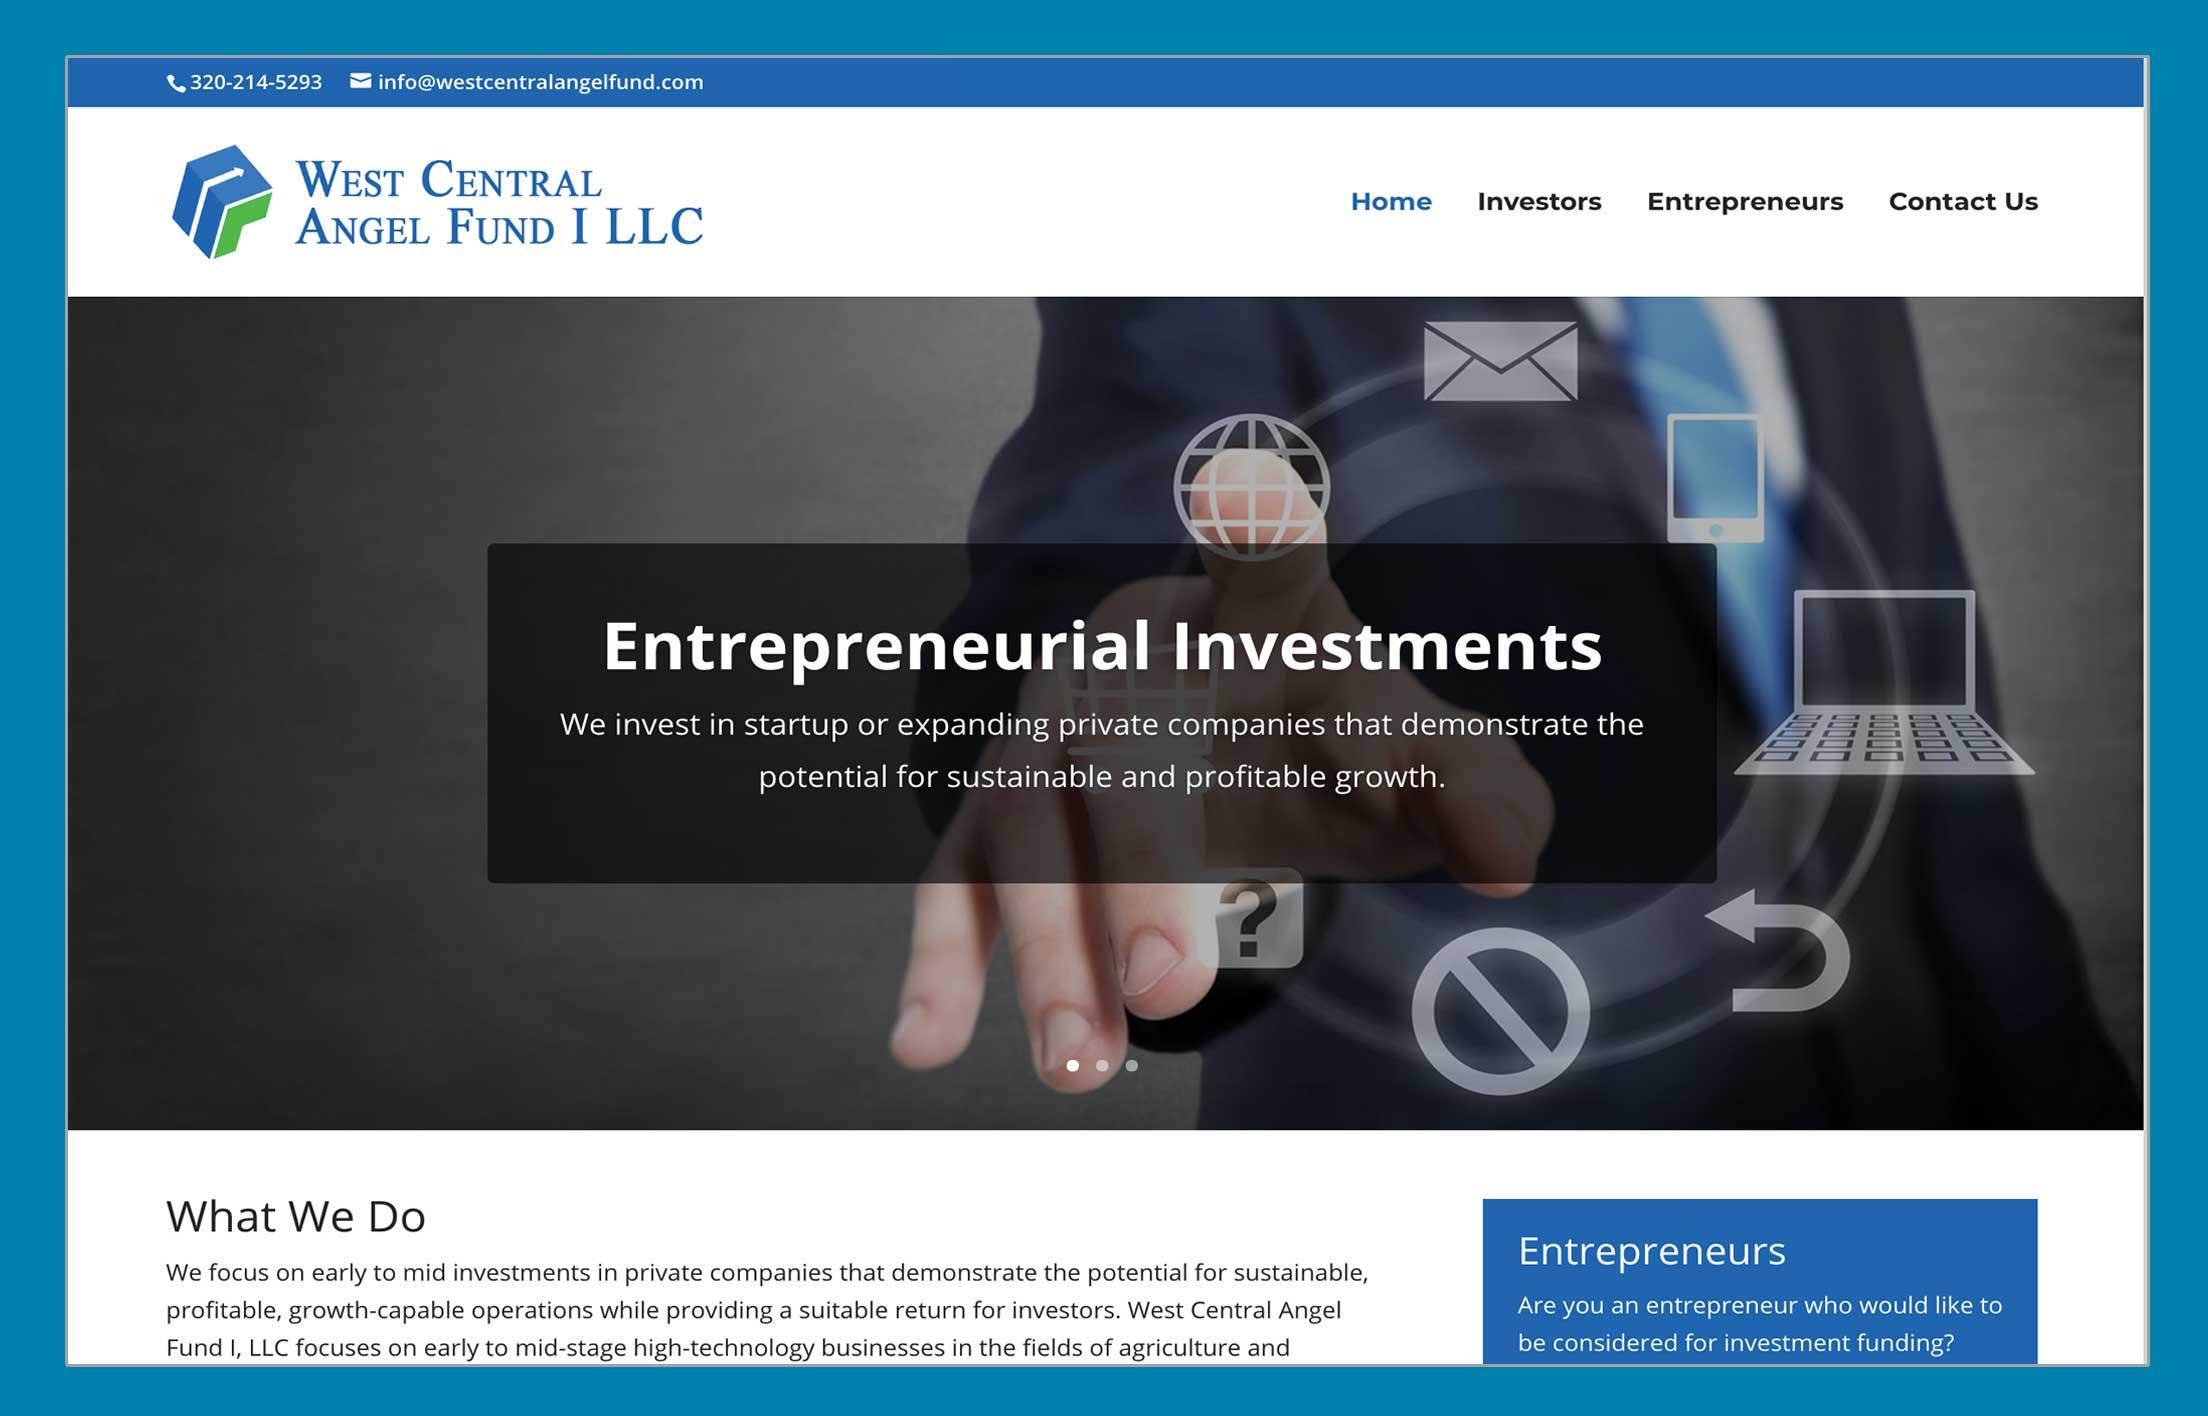 West Central Angel Fund